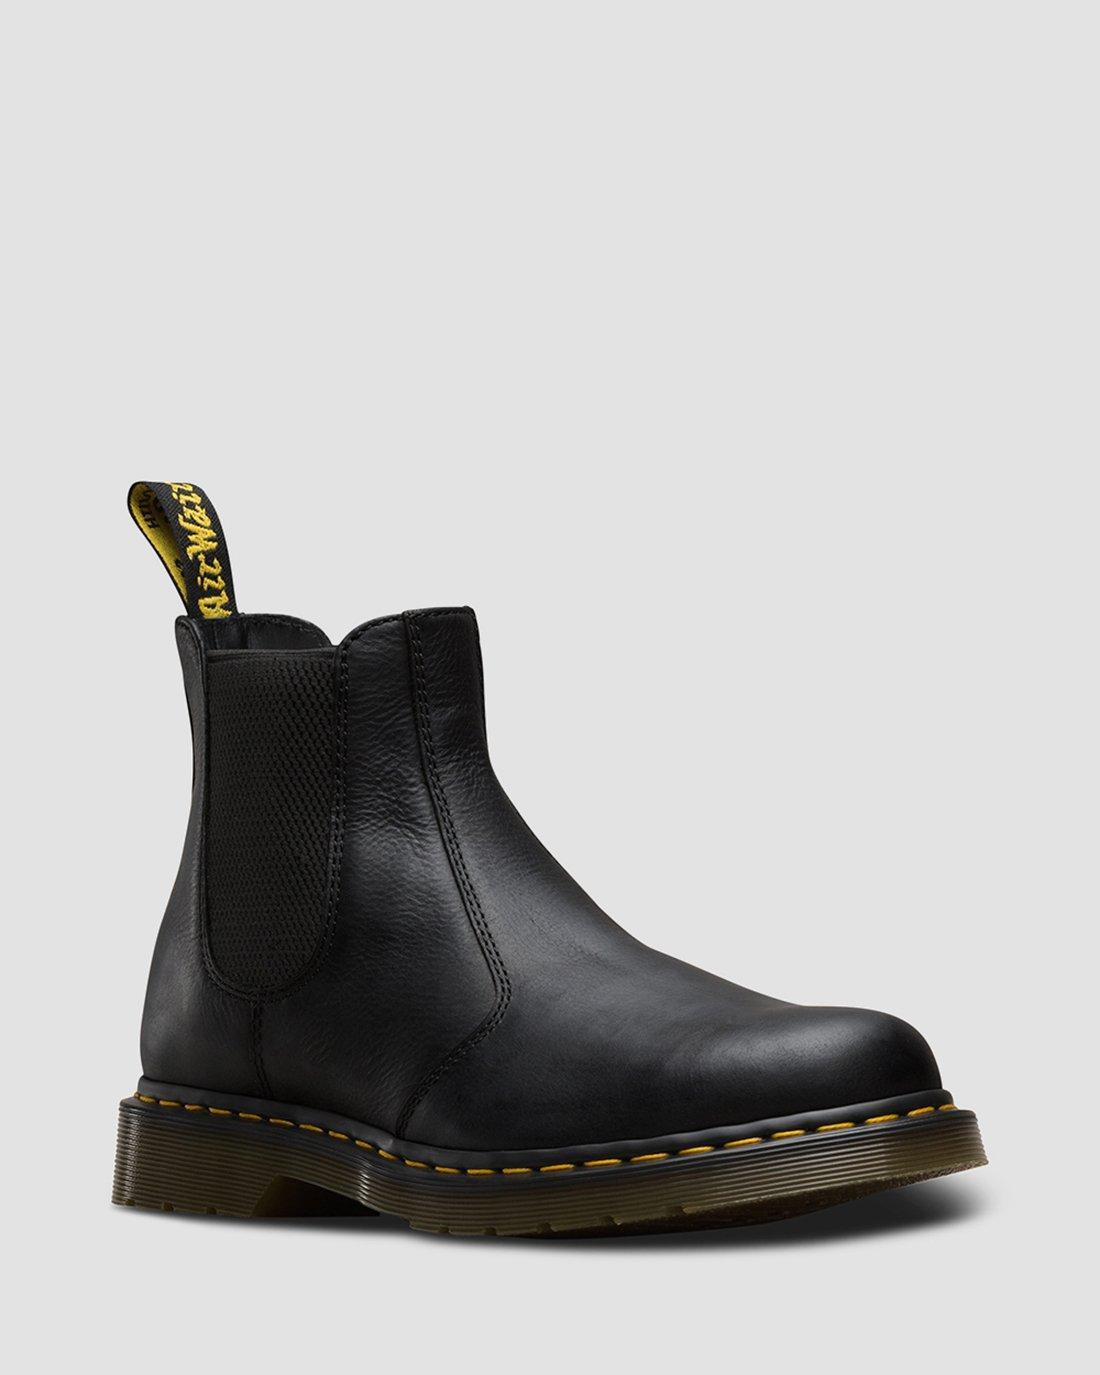 Dr. Martens 1460 Carpathian Boots for Men Black